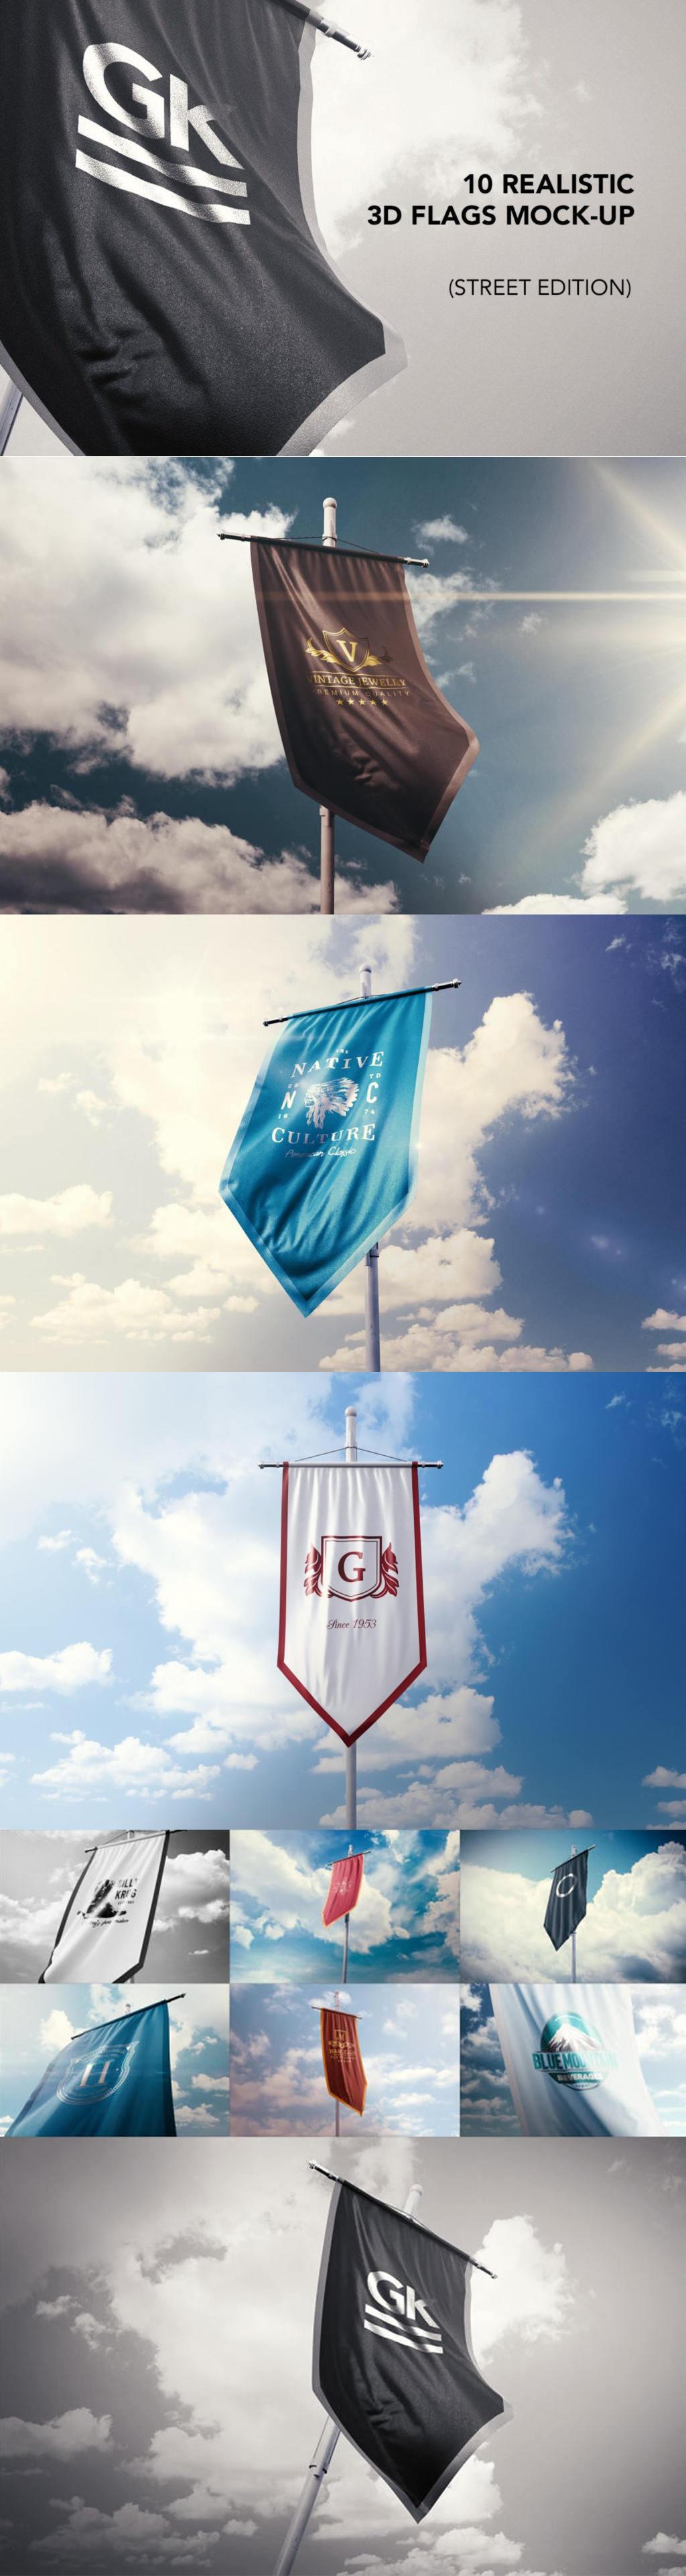 10款立体道旗样机企业旗帜logo样机ps素材贴图模板10 Realistic 3D Flag Mock Ups v.2